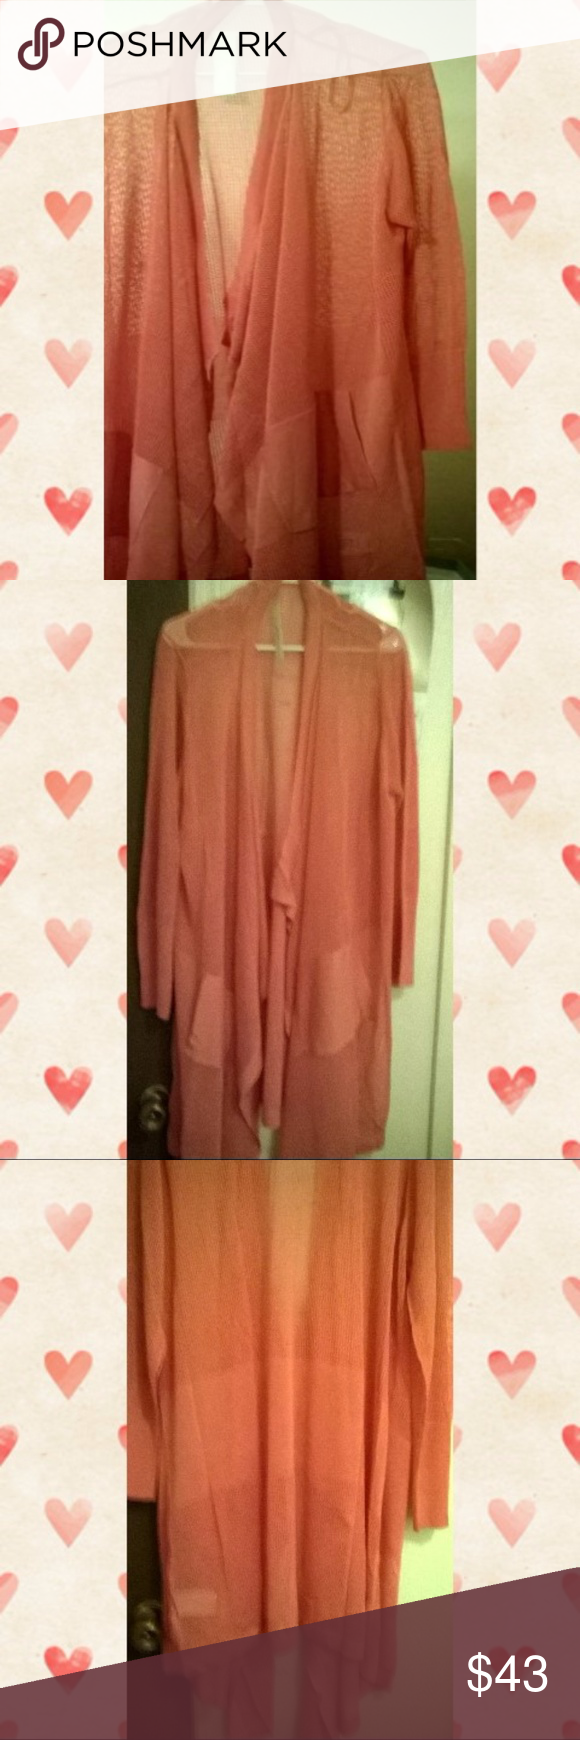 Burnt orange dress plus size  Melissa mccarthy plus size mesh cardigan size x  Melissa mccarthy